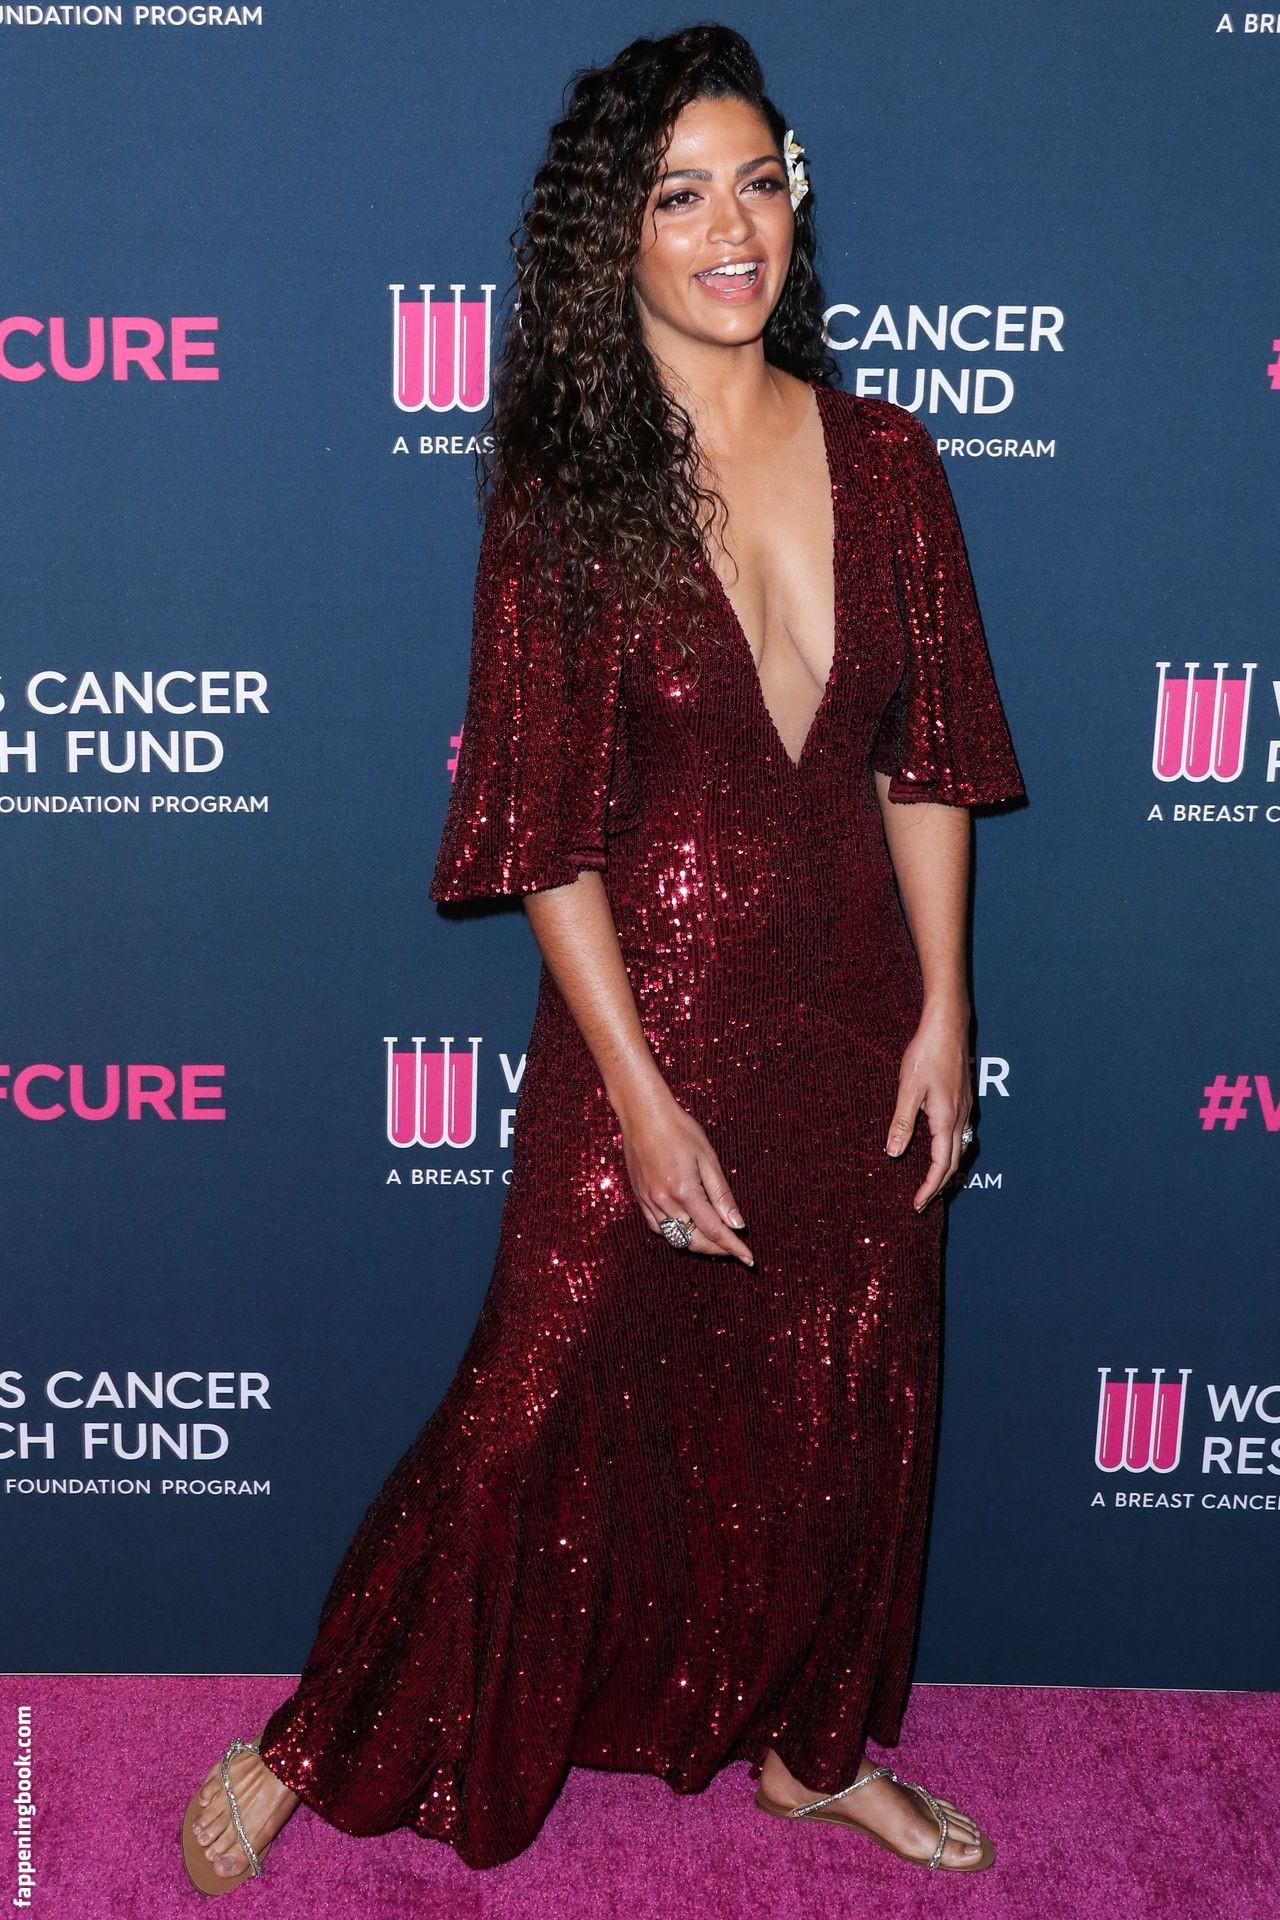 Camila Alves McConaughey Nude